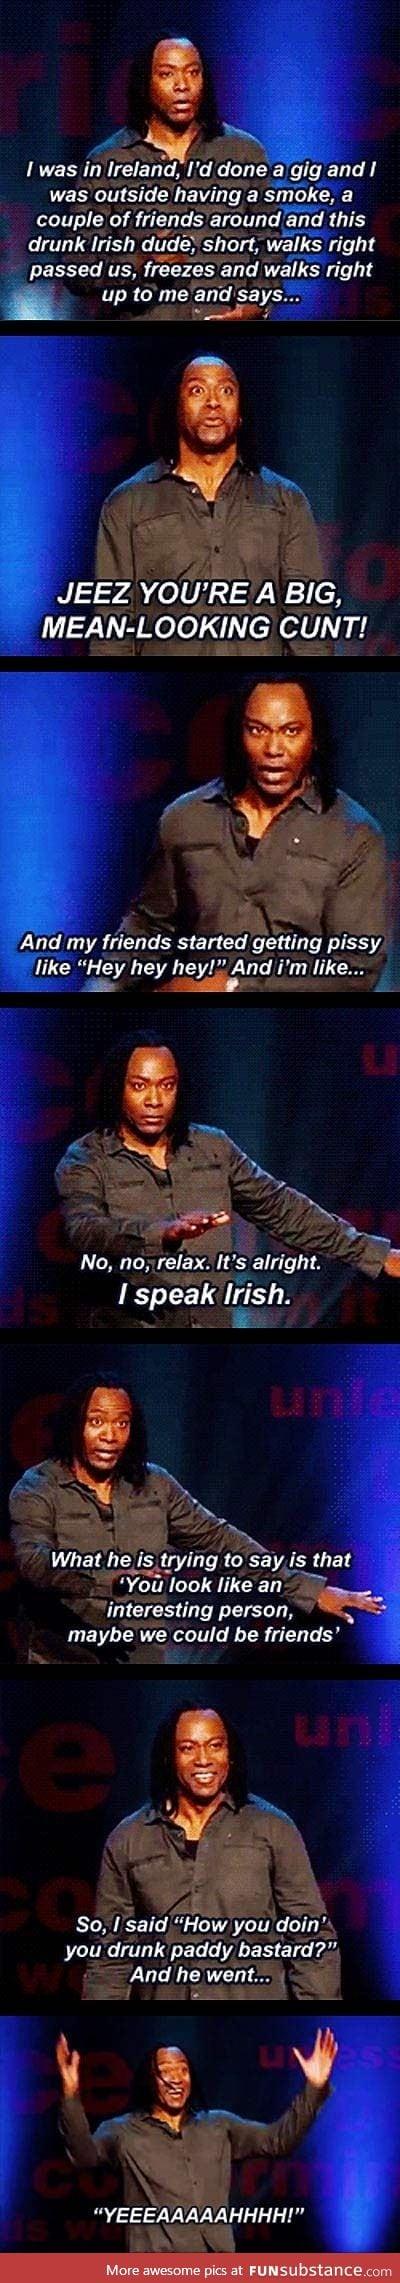 I thought that's how you speak Australian